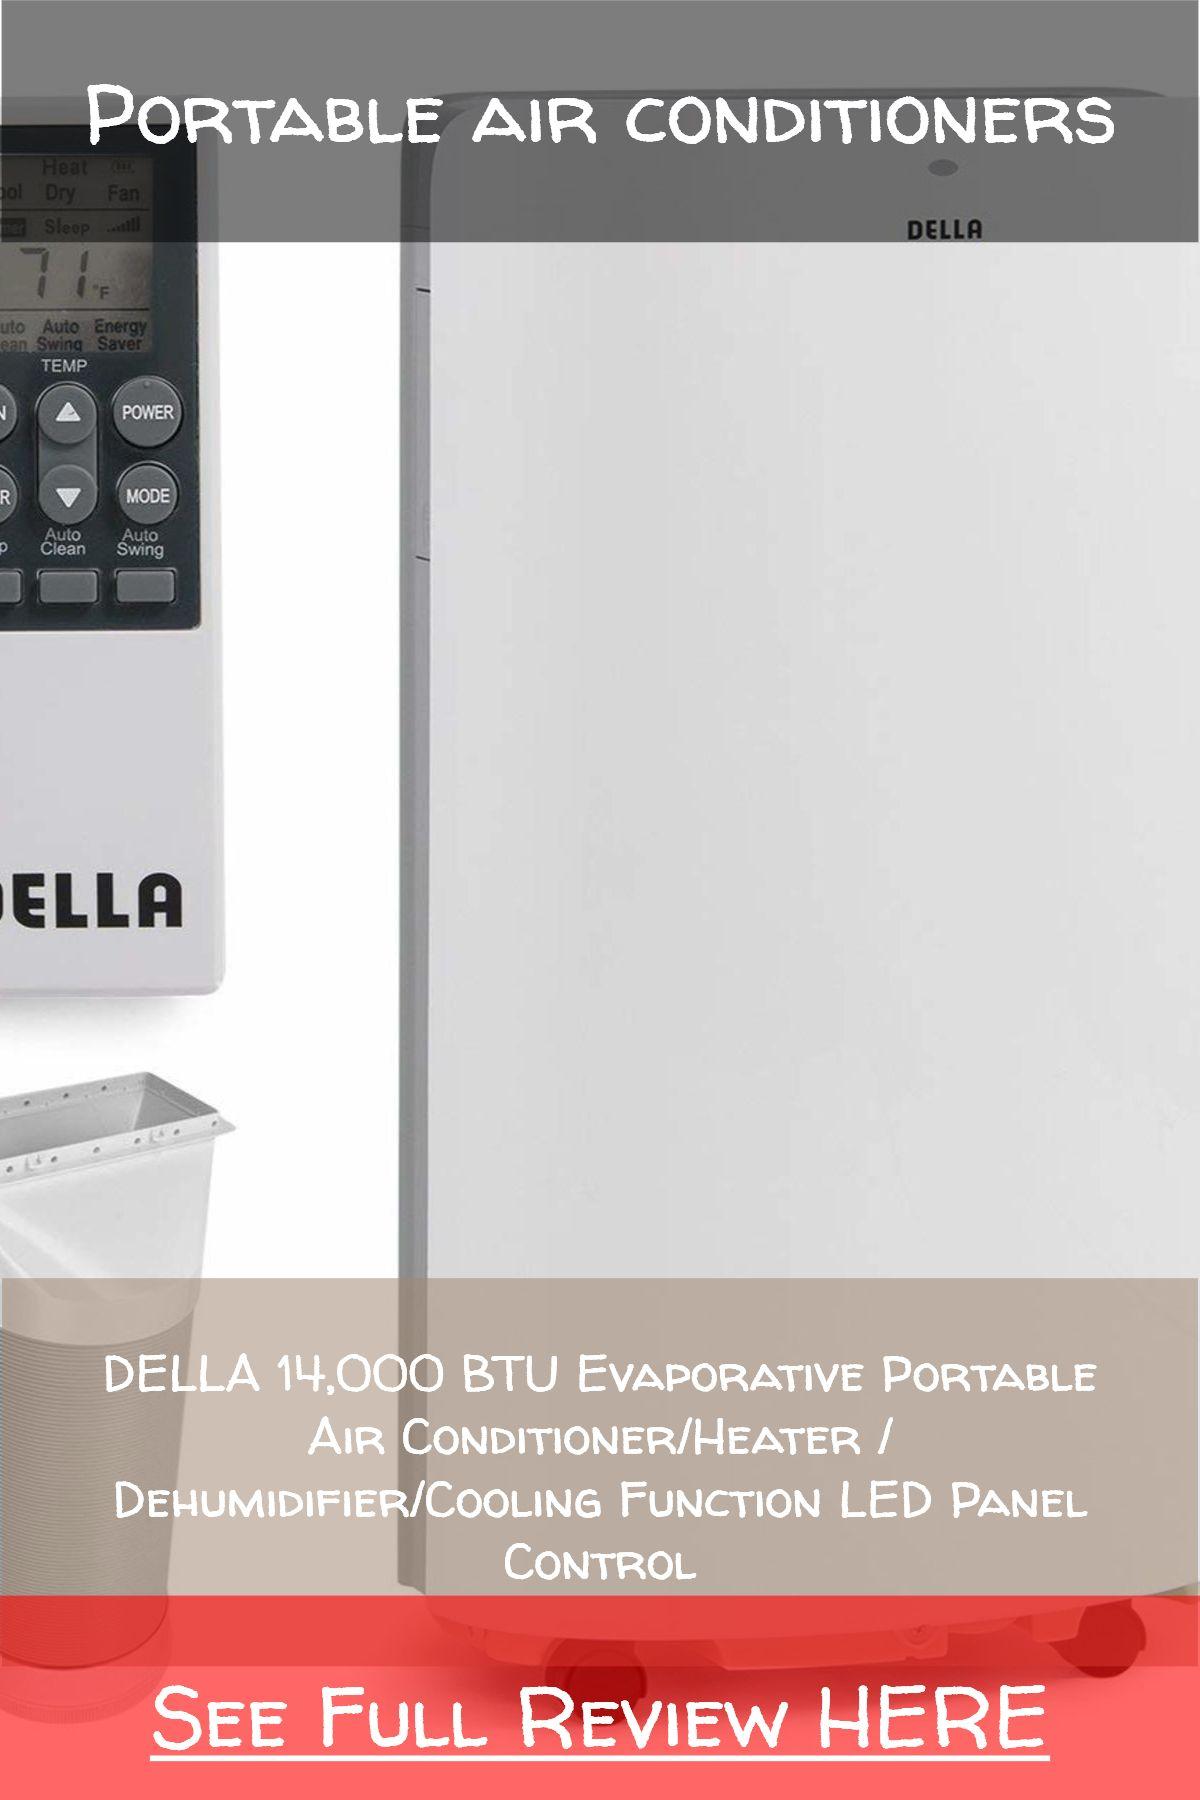 Portable air conditioners / DELLA 14,000 BTU Evaporative